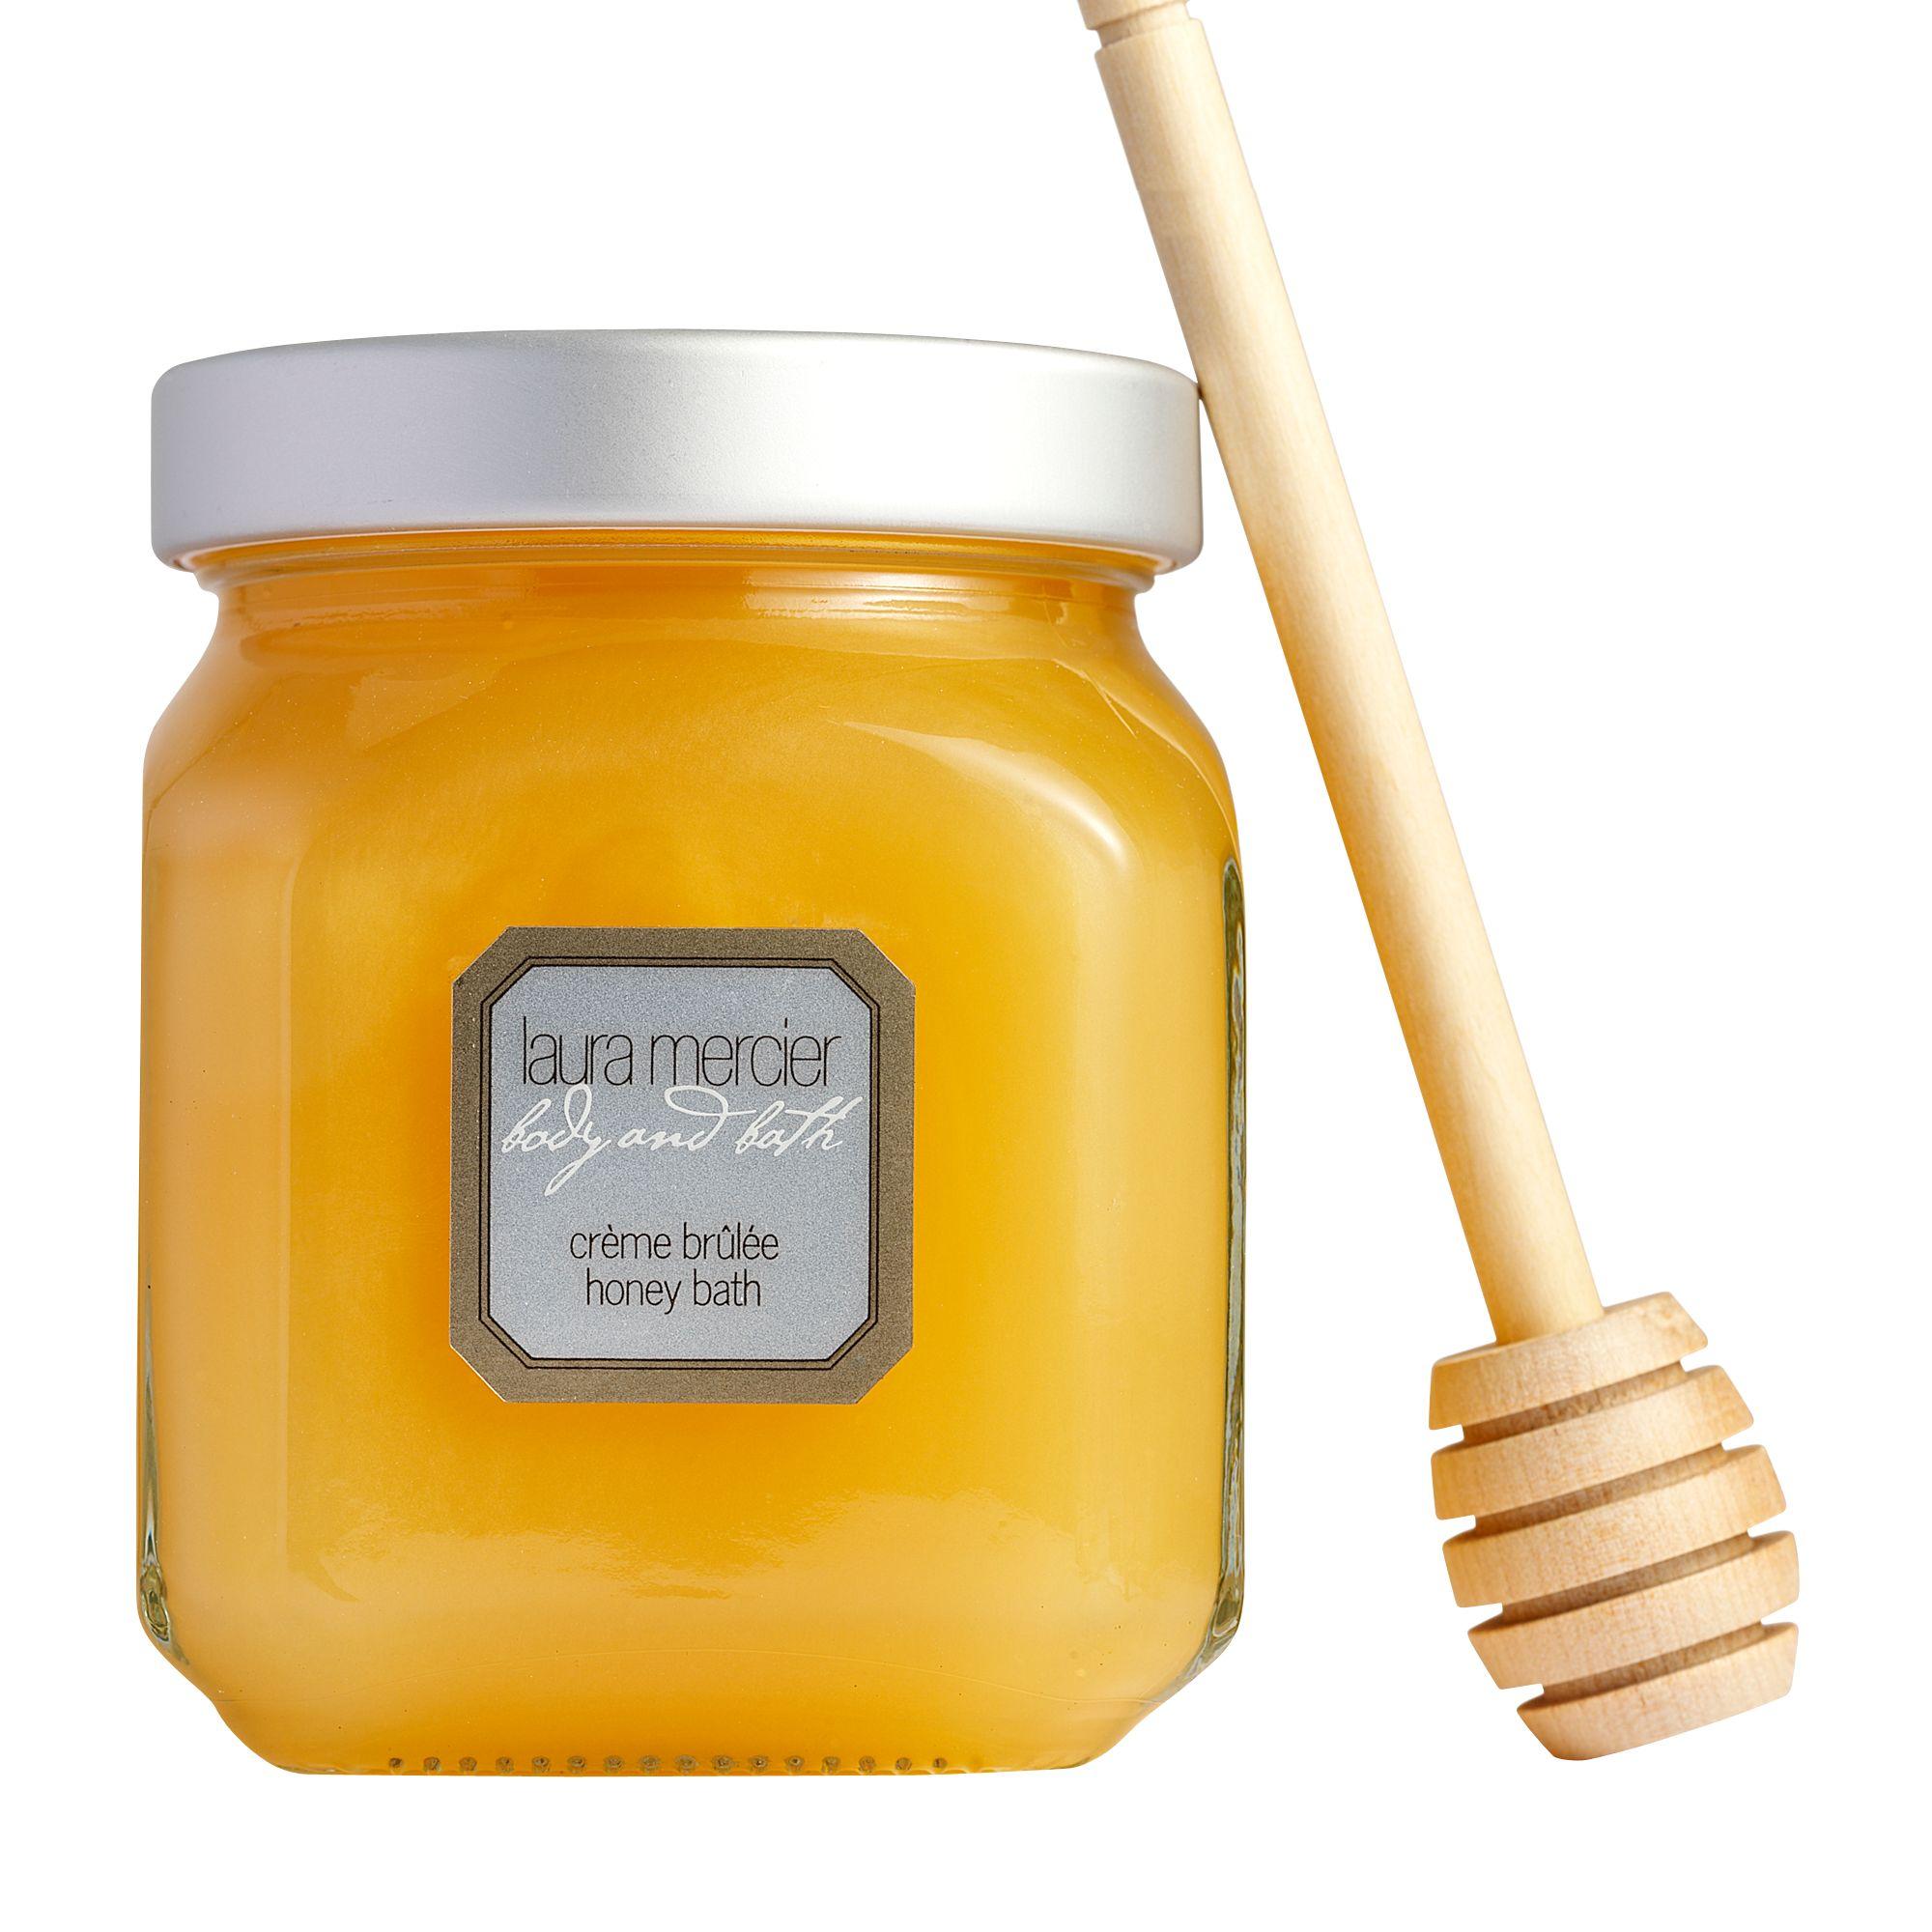 Laura Mercier Laura Mercier Crème Brulee Honey Bath, 300g